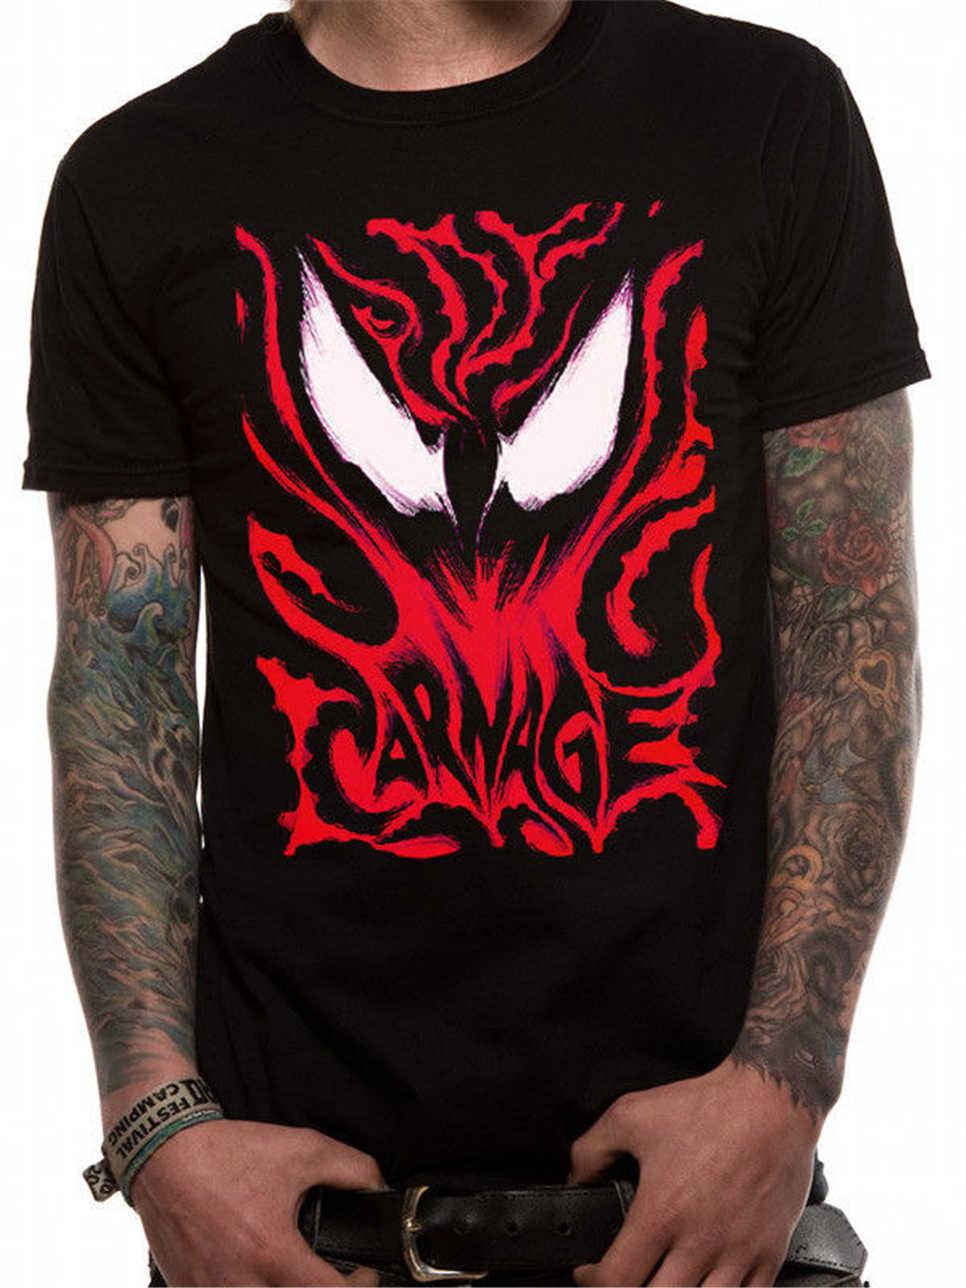 Carnage Face Venom комиксы Marvel Человек-паук Черная Мужская футболка уличная забавная футболка